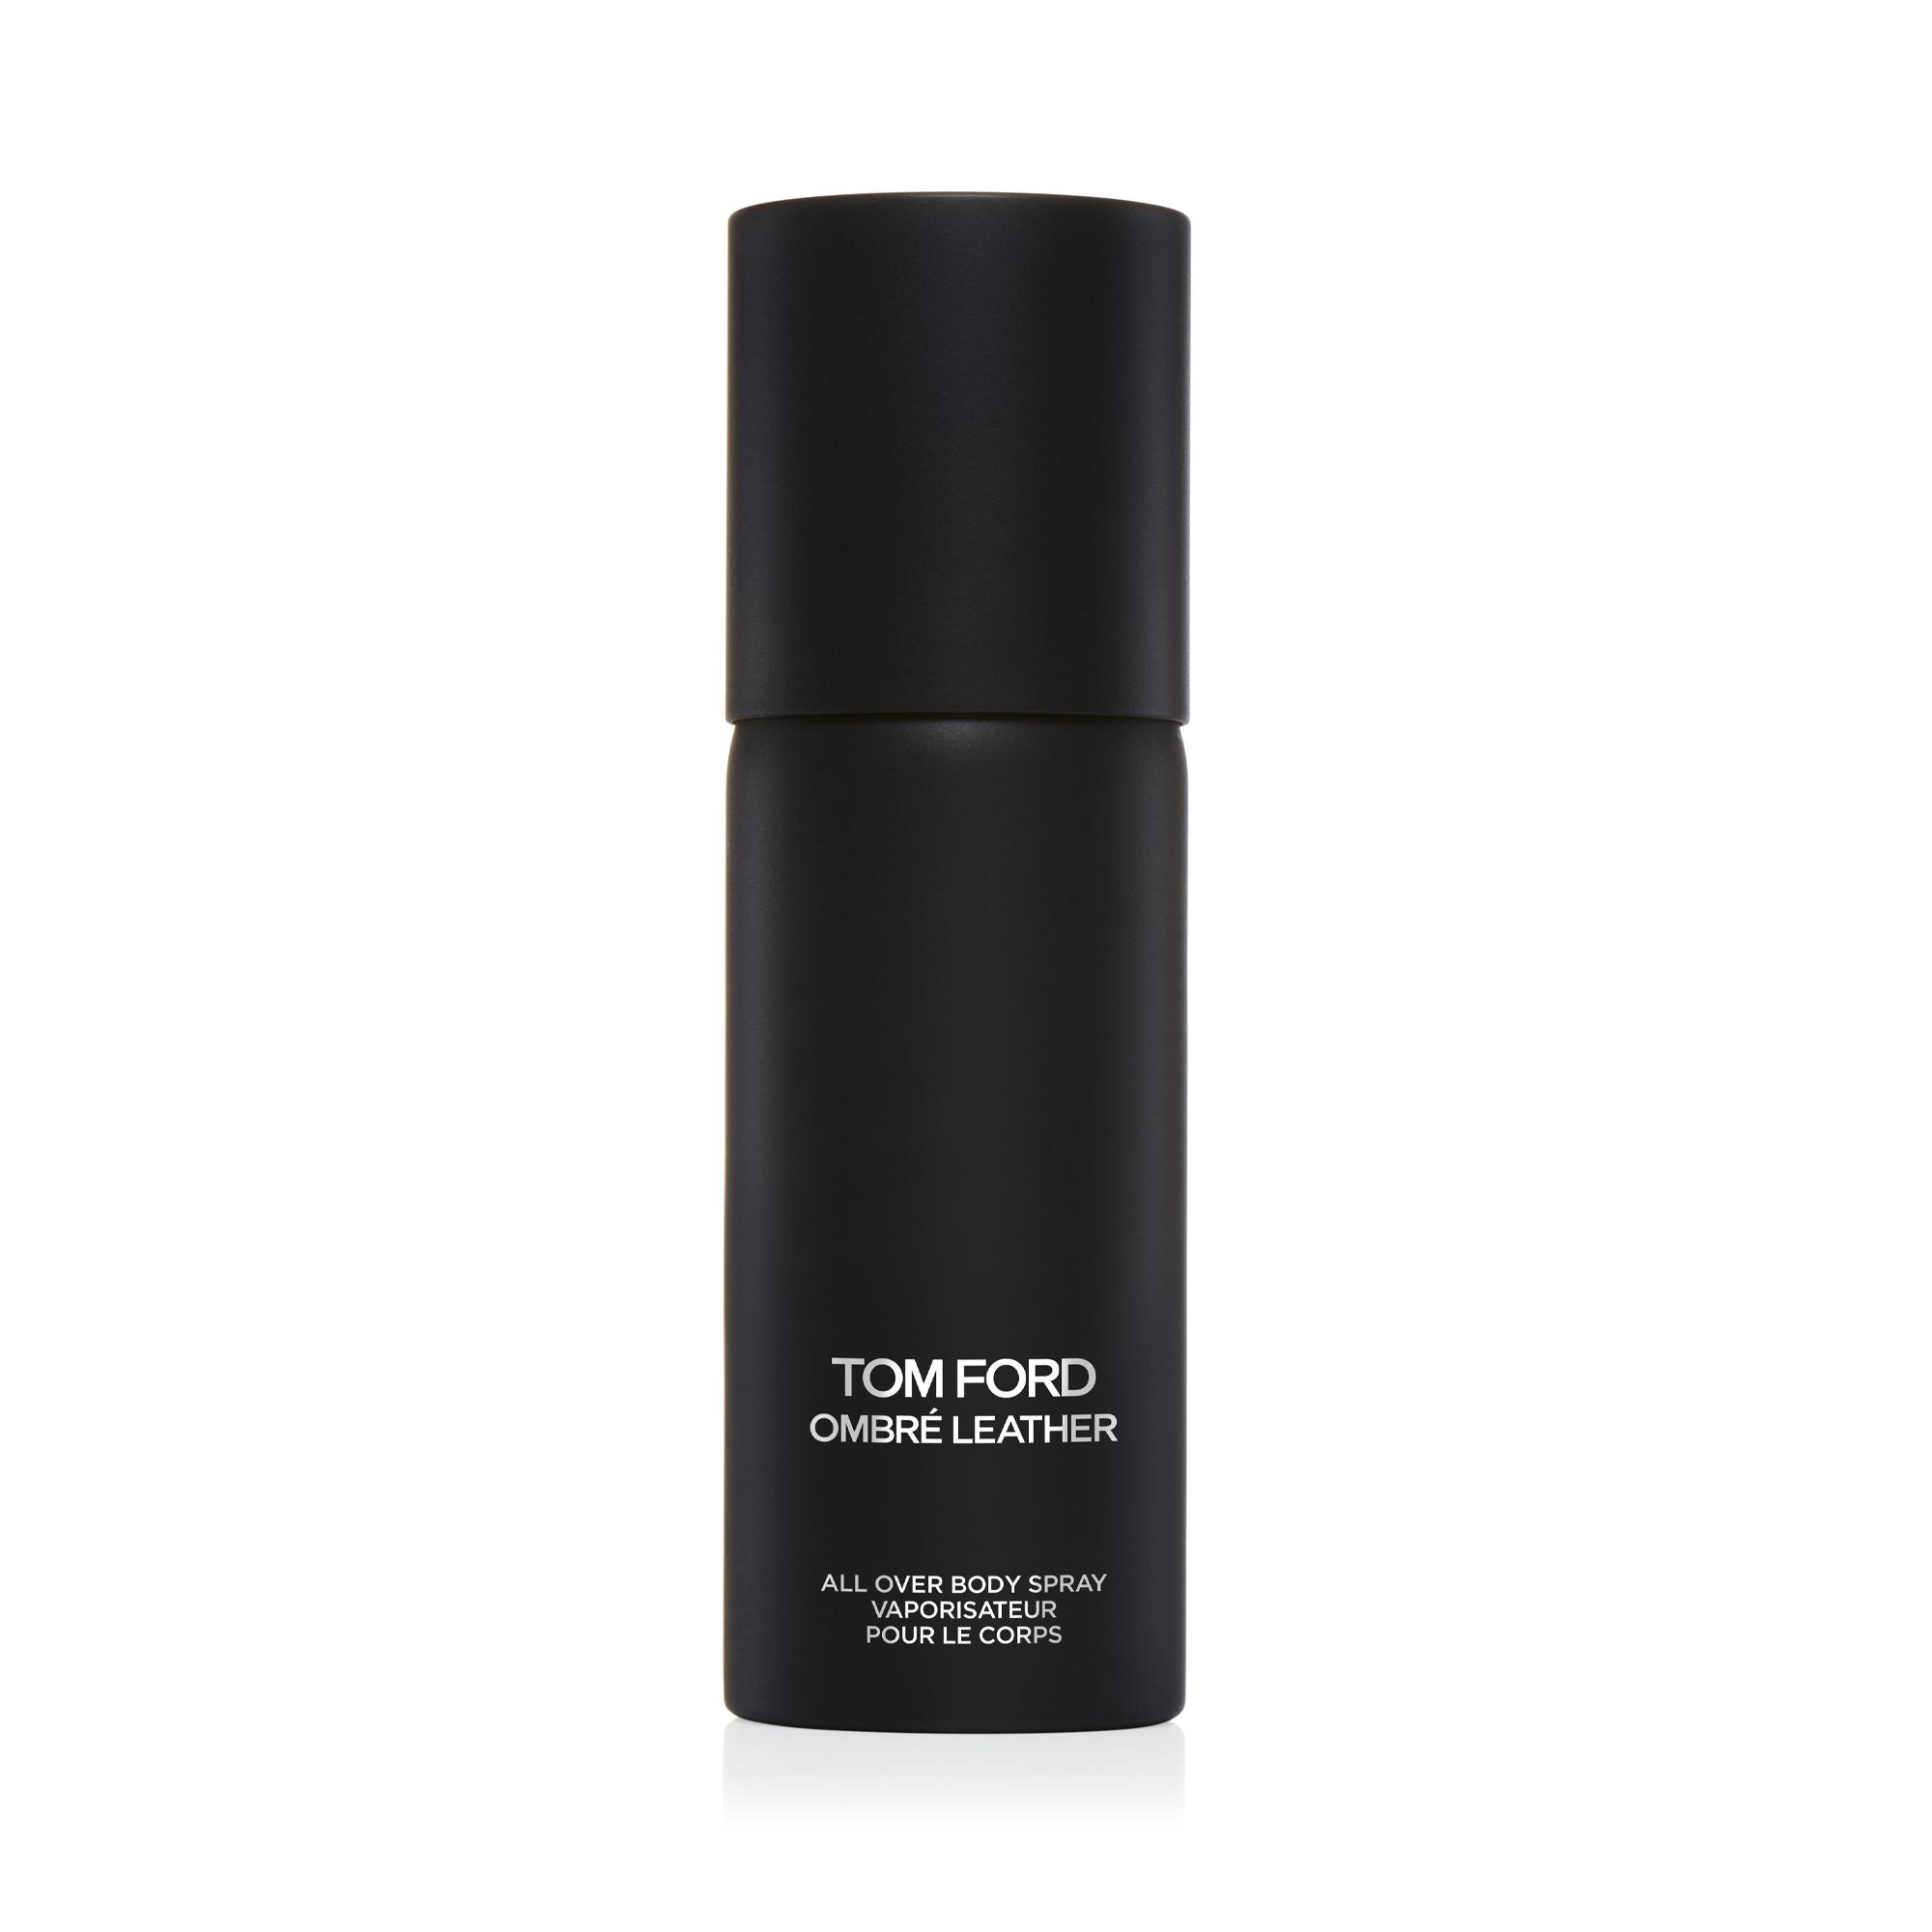 Tom Ford Ombré Leather All Over Body Spray, 150 ml